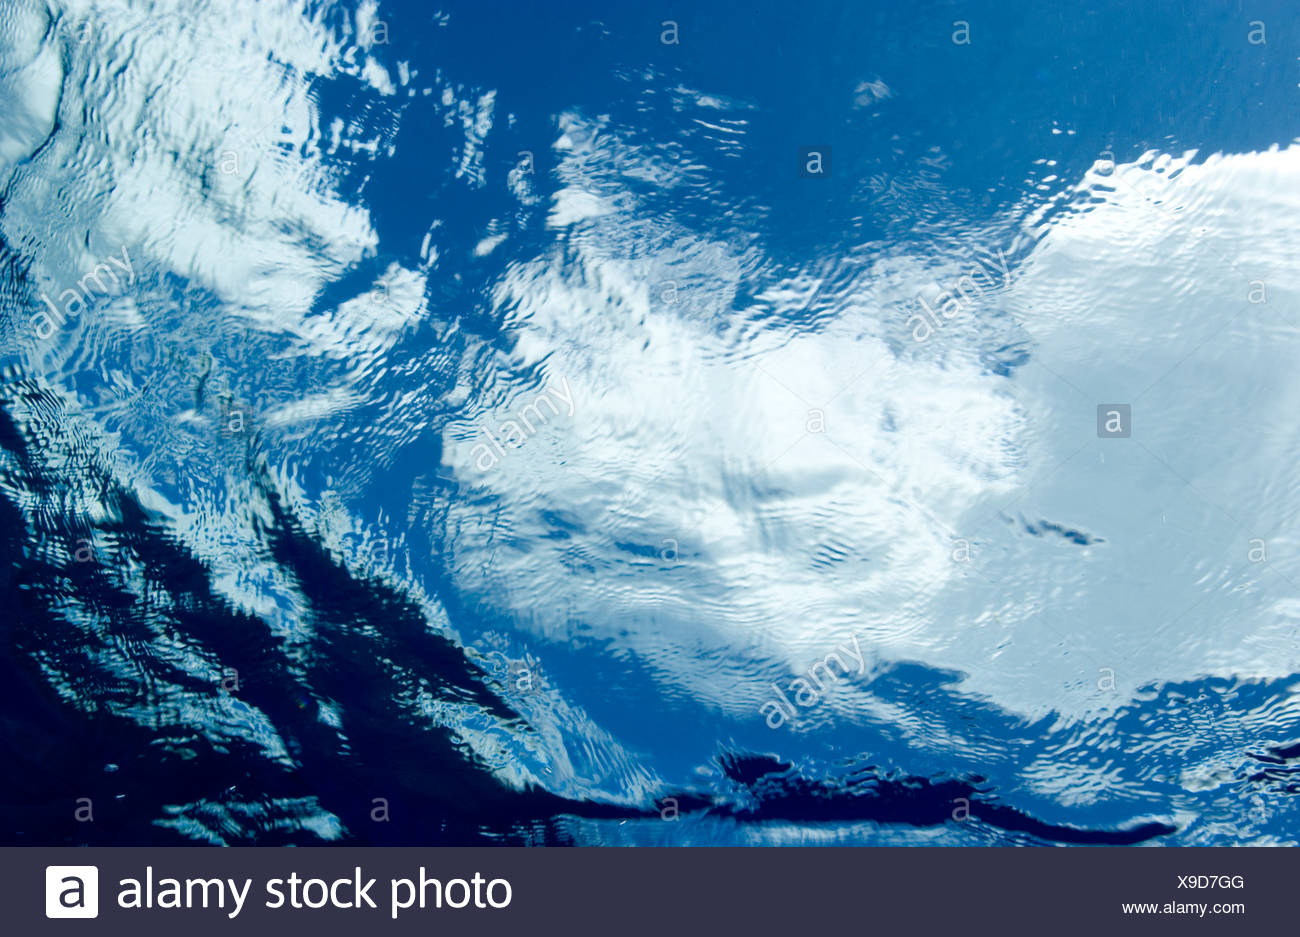 Vista submarina de superficie del agua nubes vistos a través de la superficie Imagen De Stock